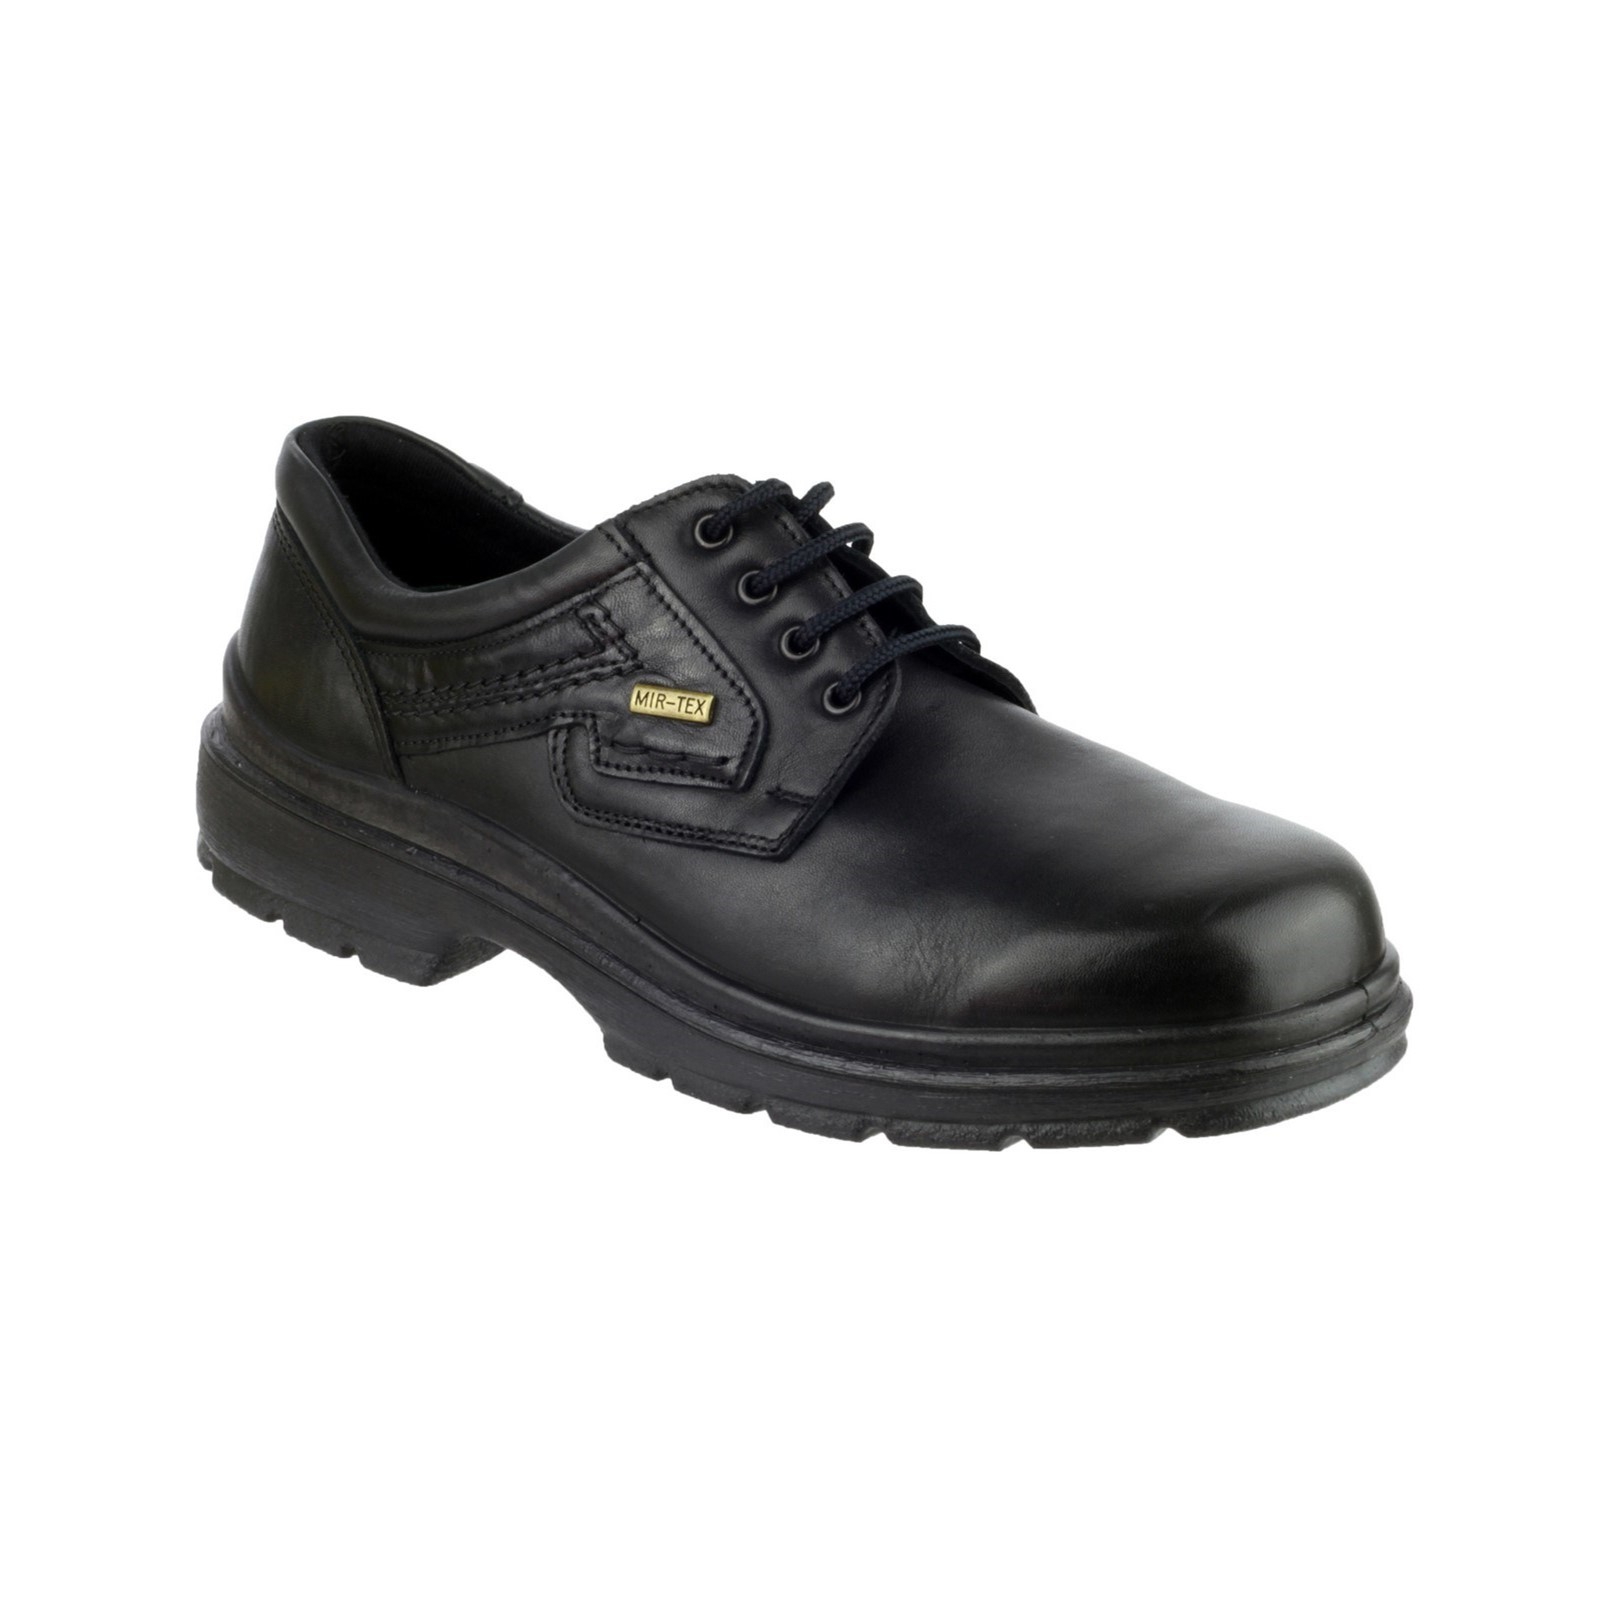 Cotswold Mens Shipston Lace Up shoes